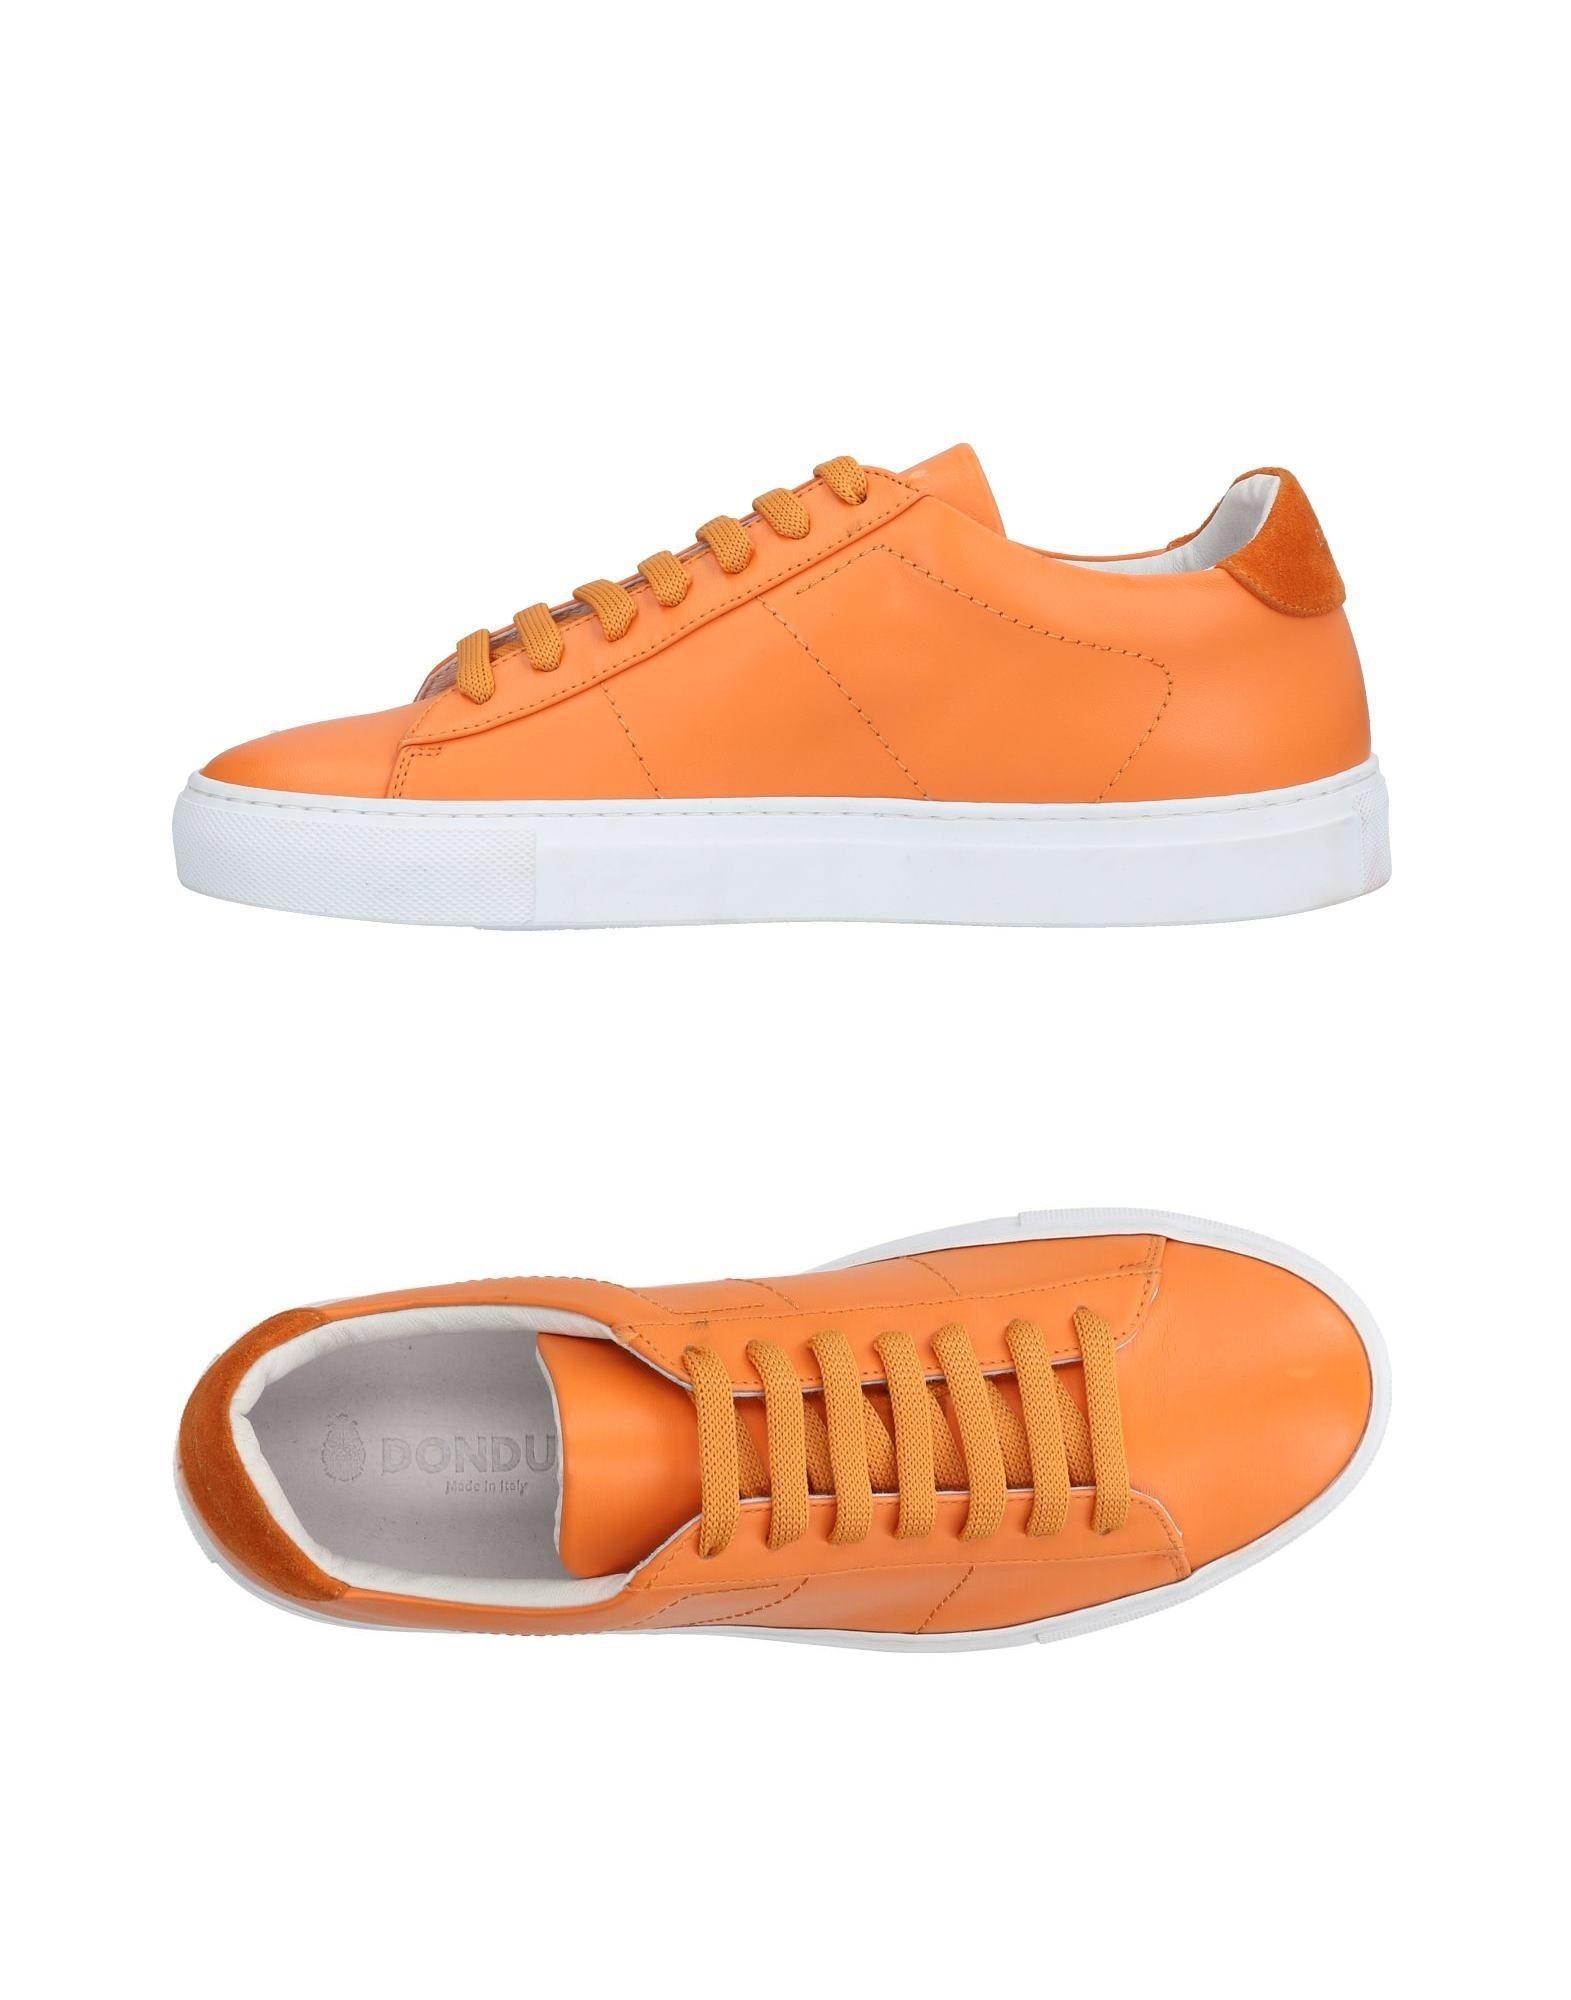 Stilvolle billige Schuhe Dondup Sneakers 11496979QU Damen  11496979QU Sneakers 8db80b